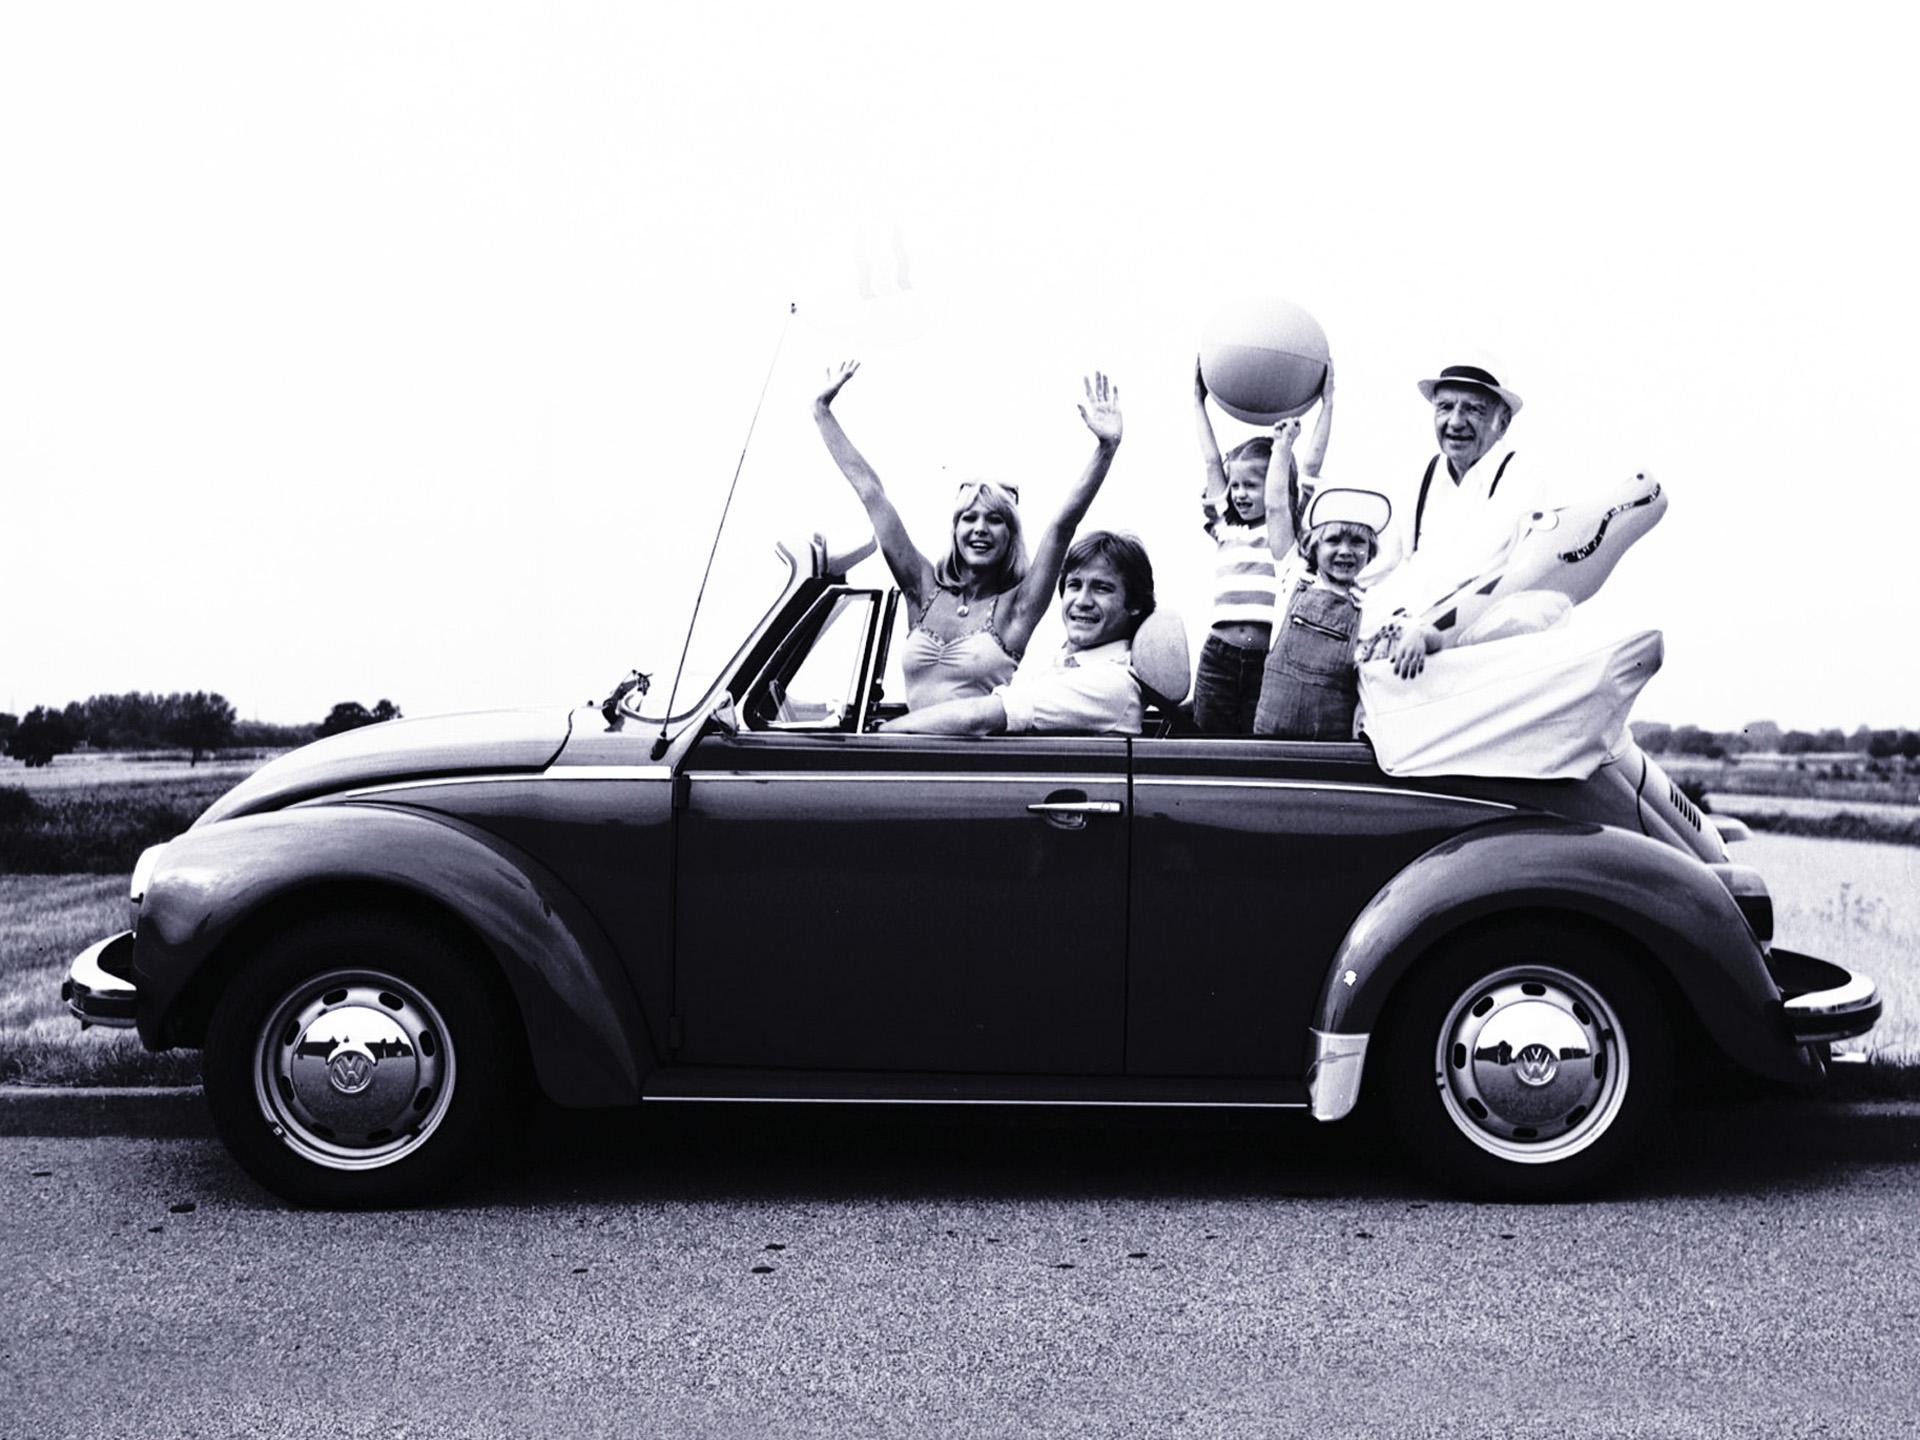 VW_09.jpg